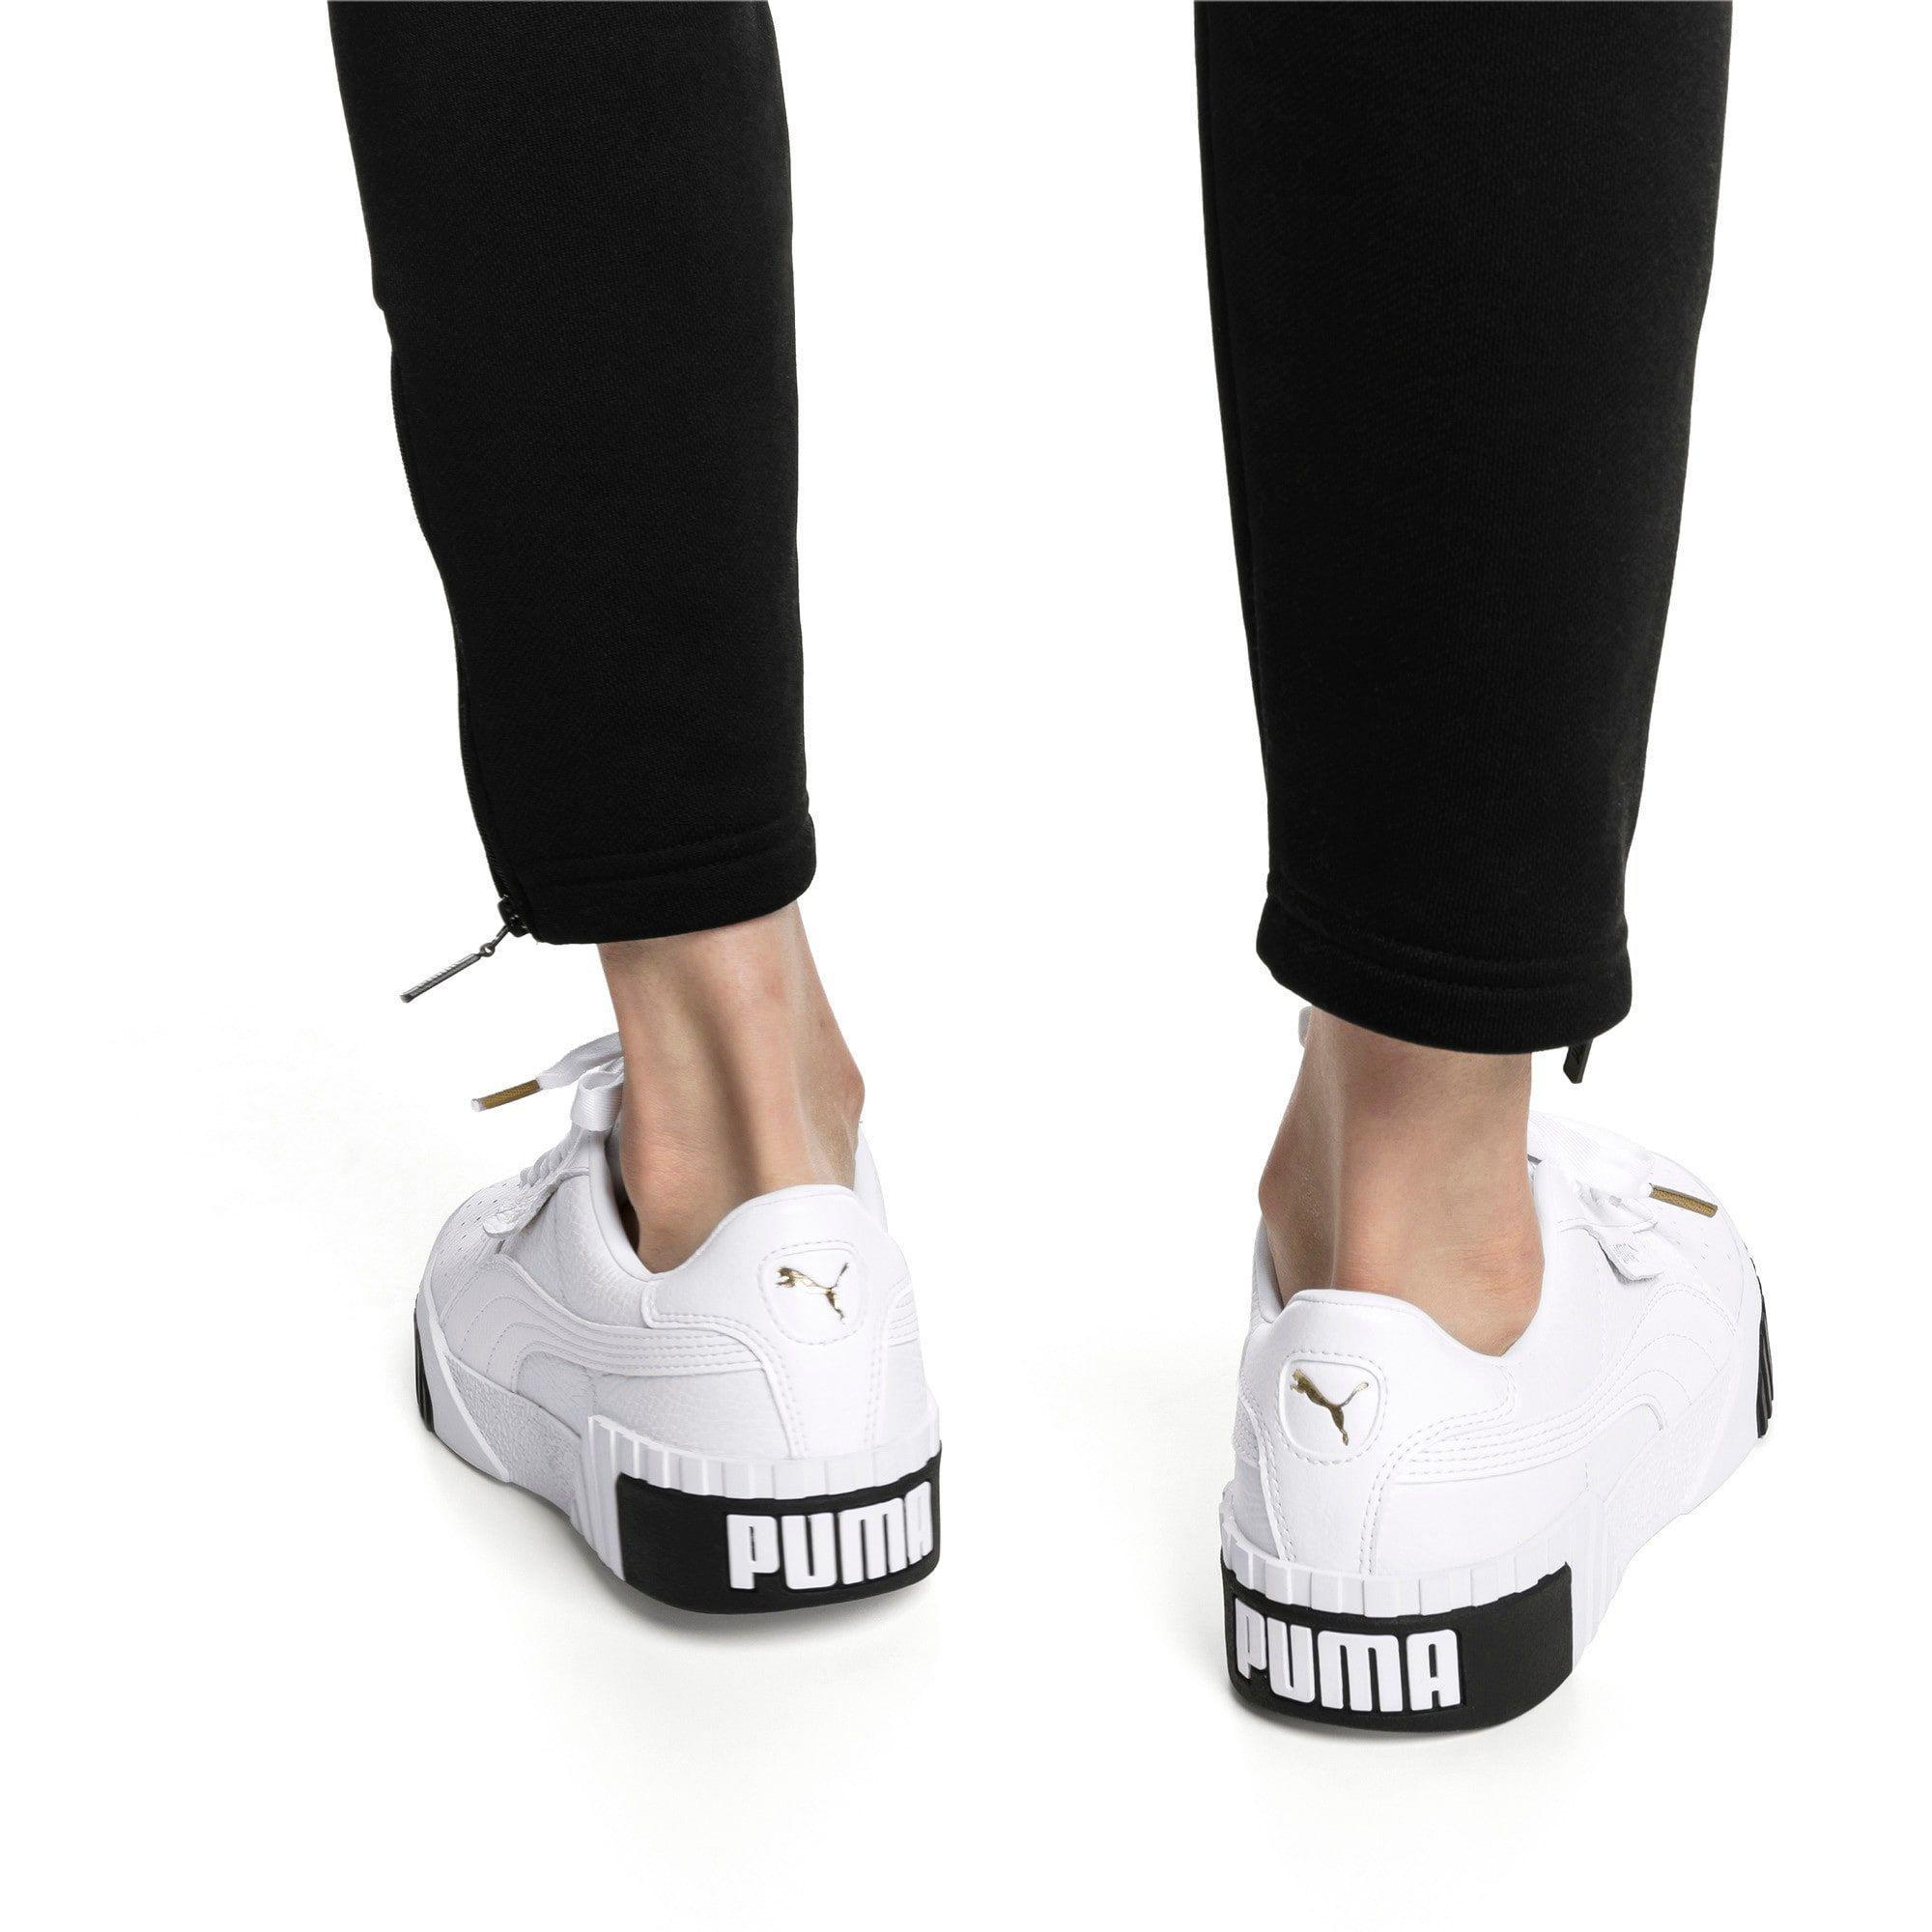 PUMA Cali Women's Trainers in White/Black size 7.5 , #Cali ...